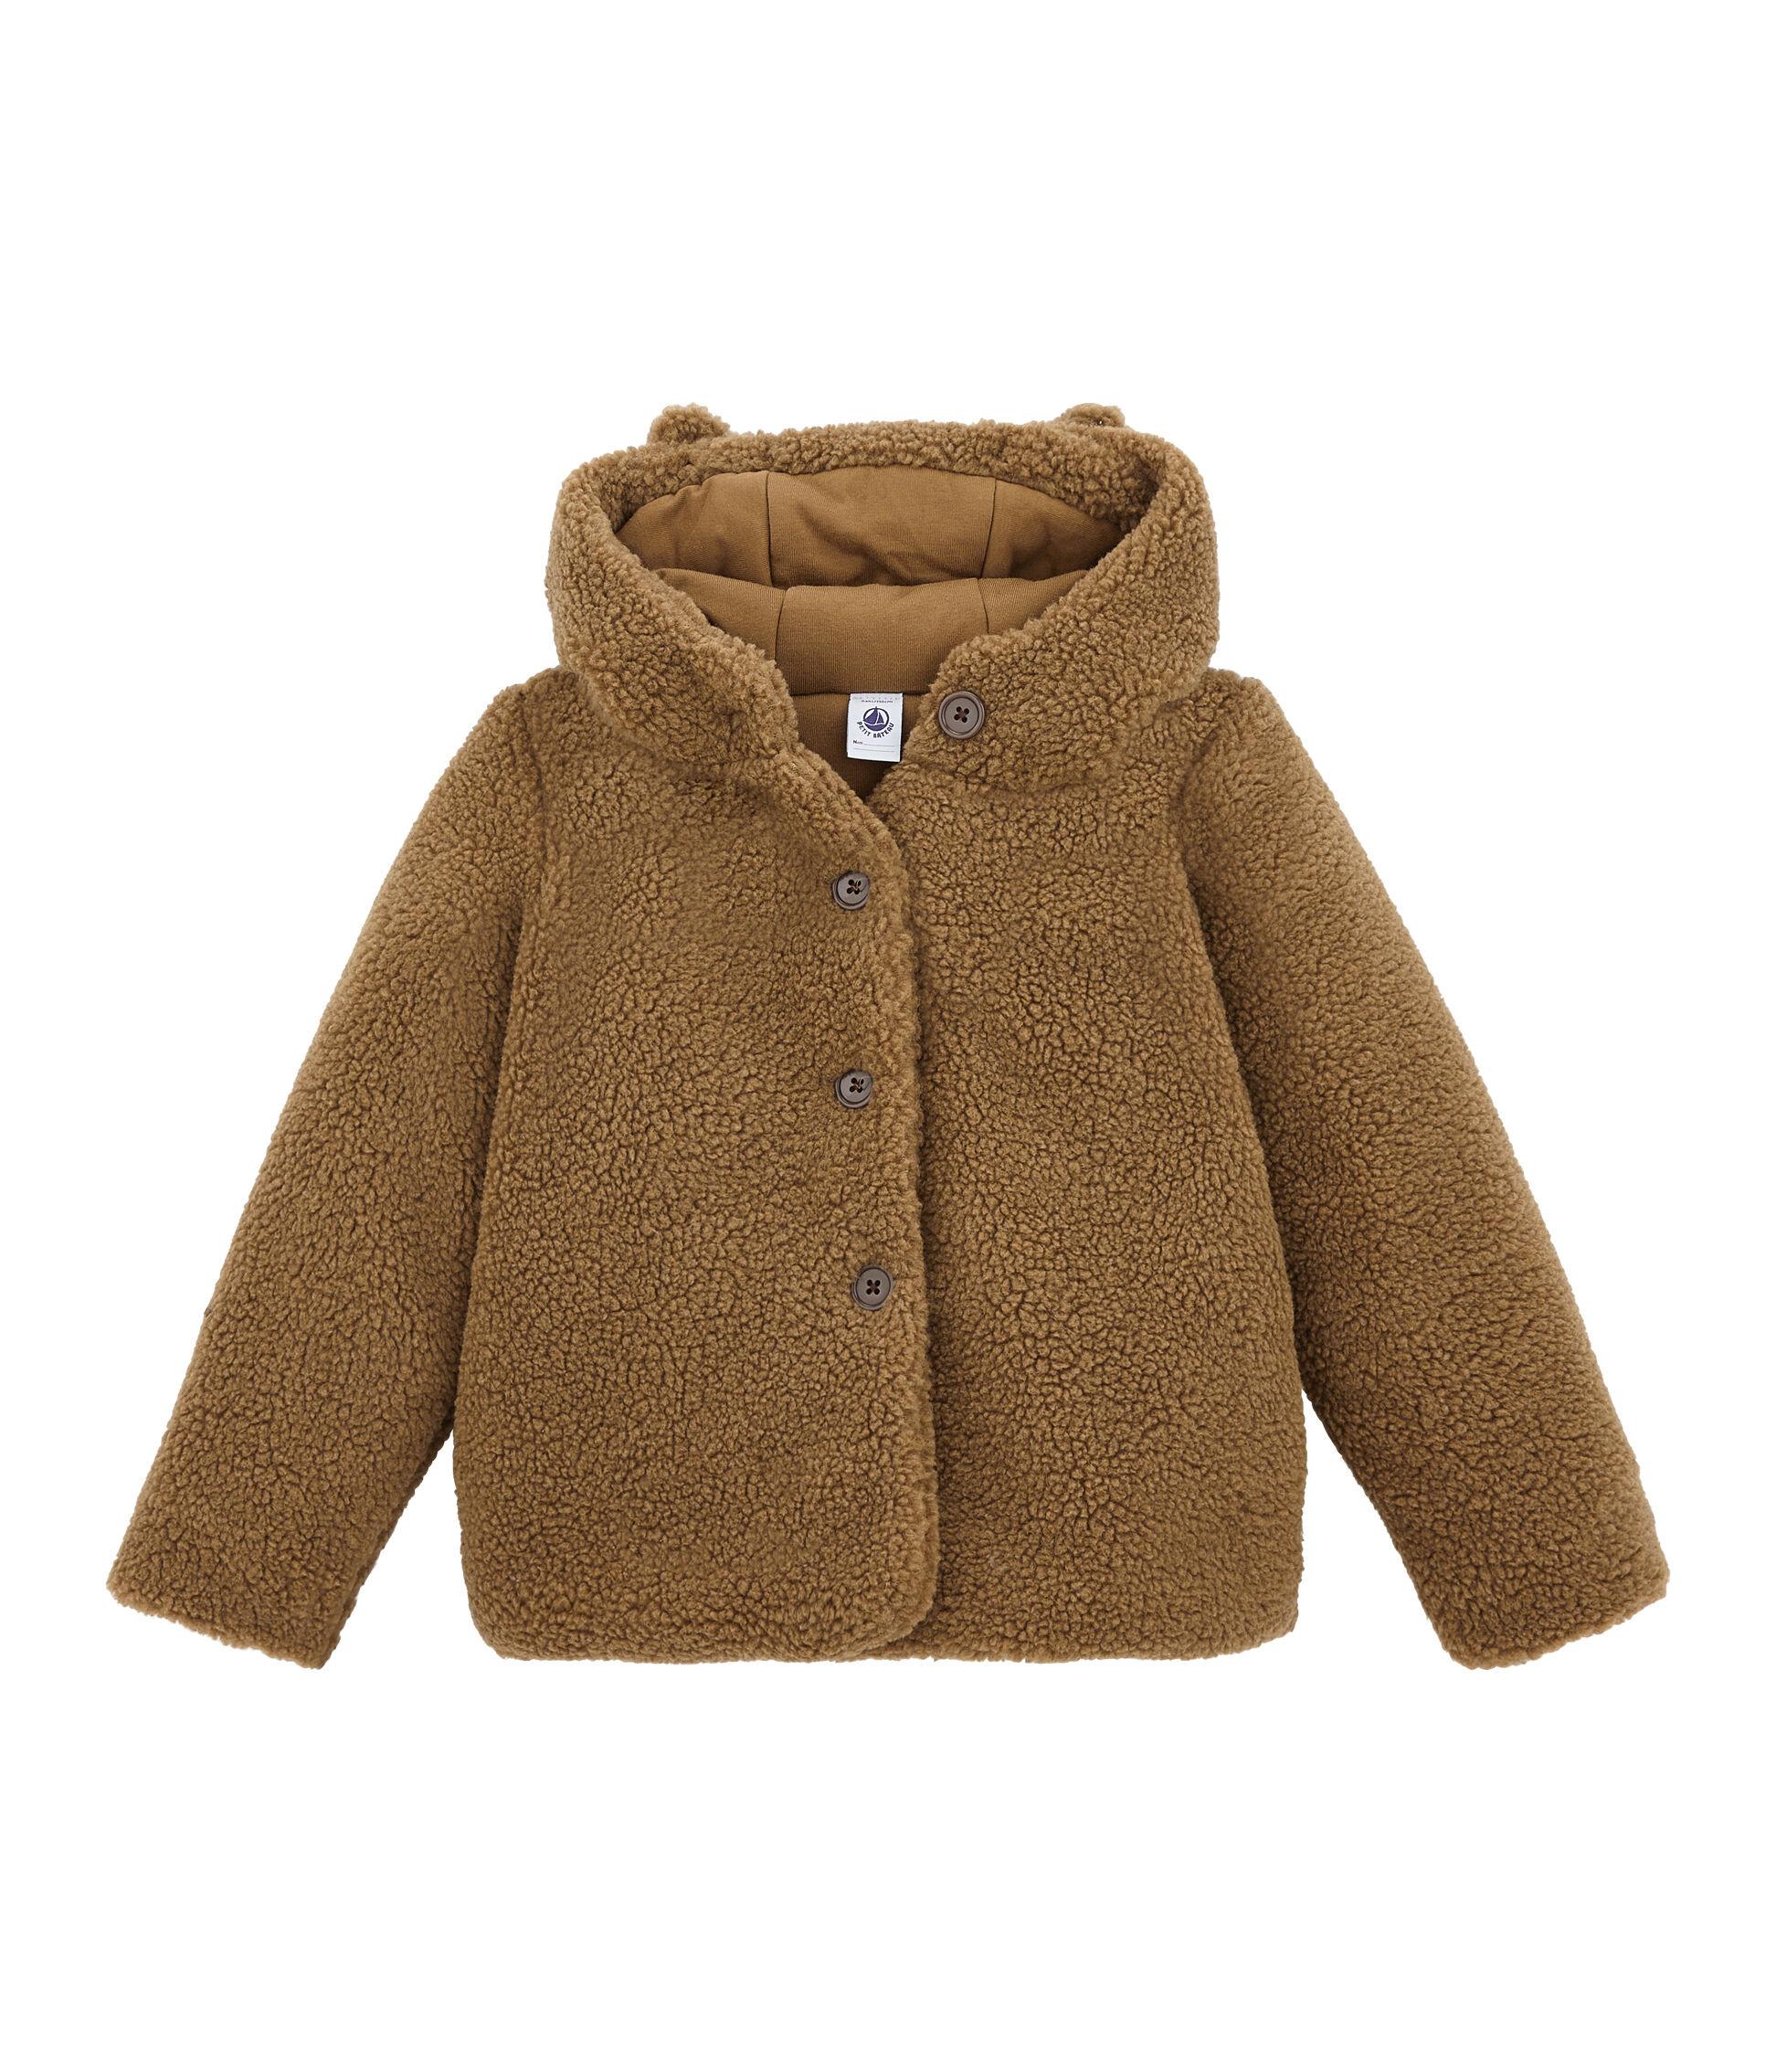 manteau sherpa enfant bateau en petit fille hqbcwhfx. Black Bedroom Furniture Sets. Home Design Ideas